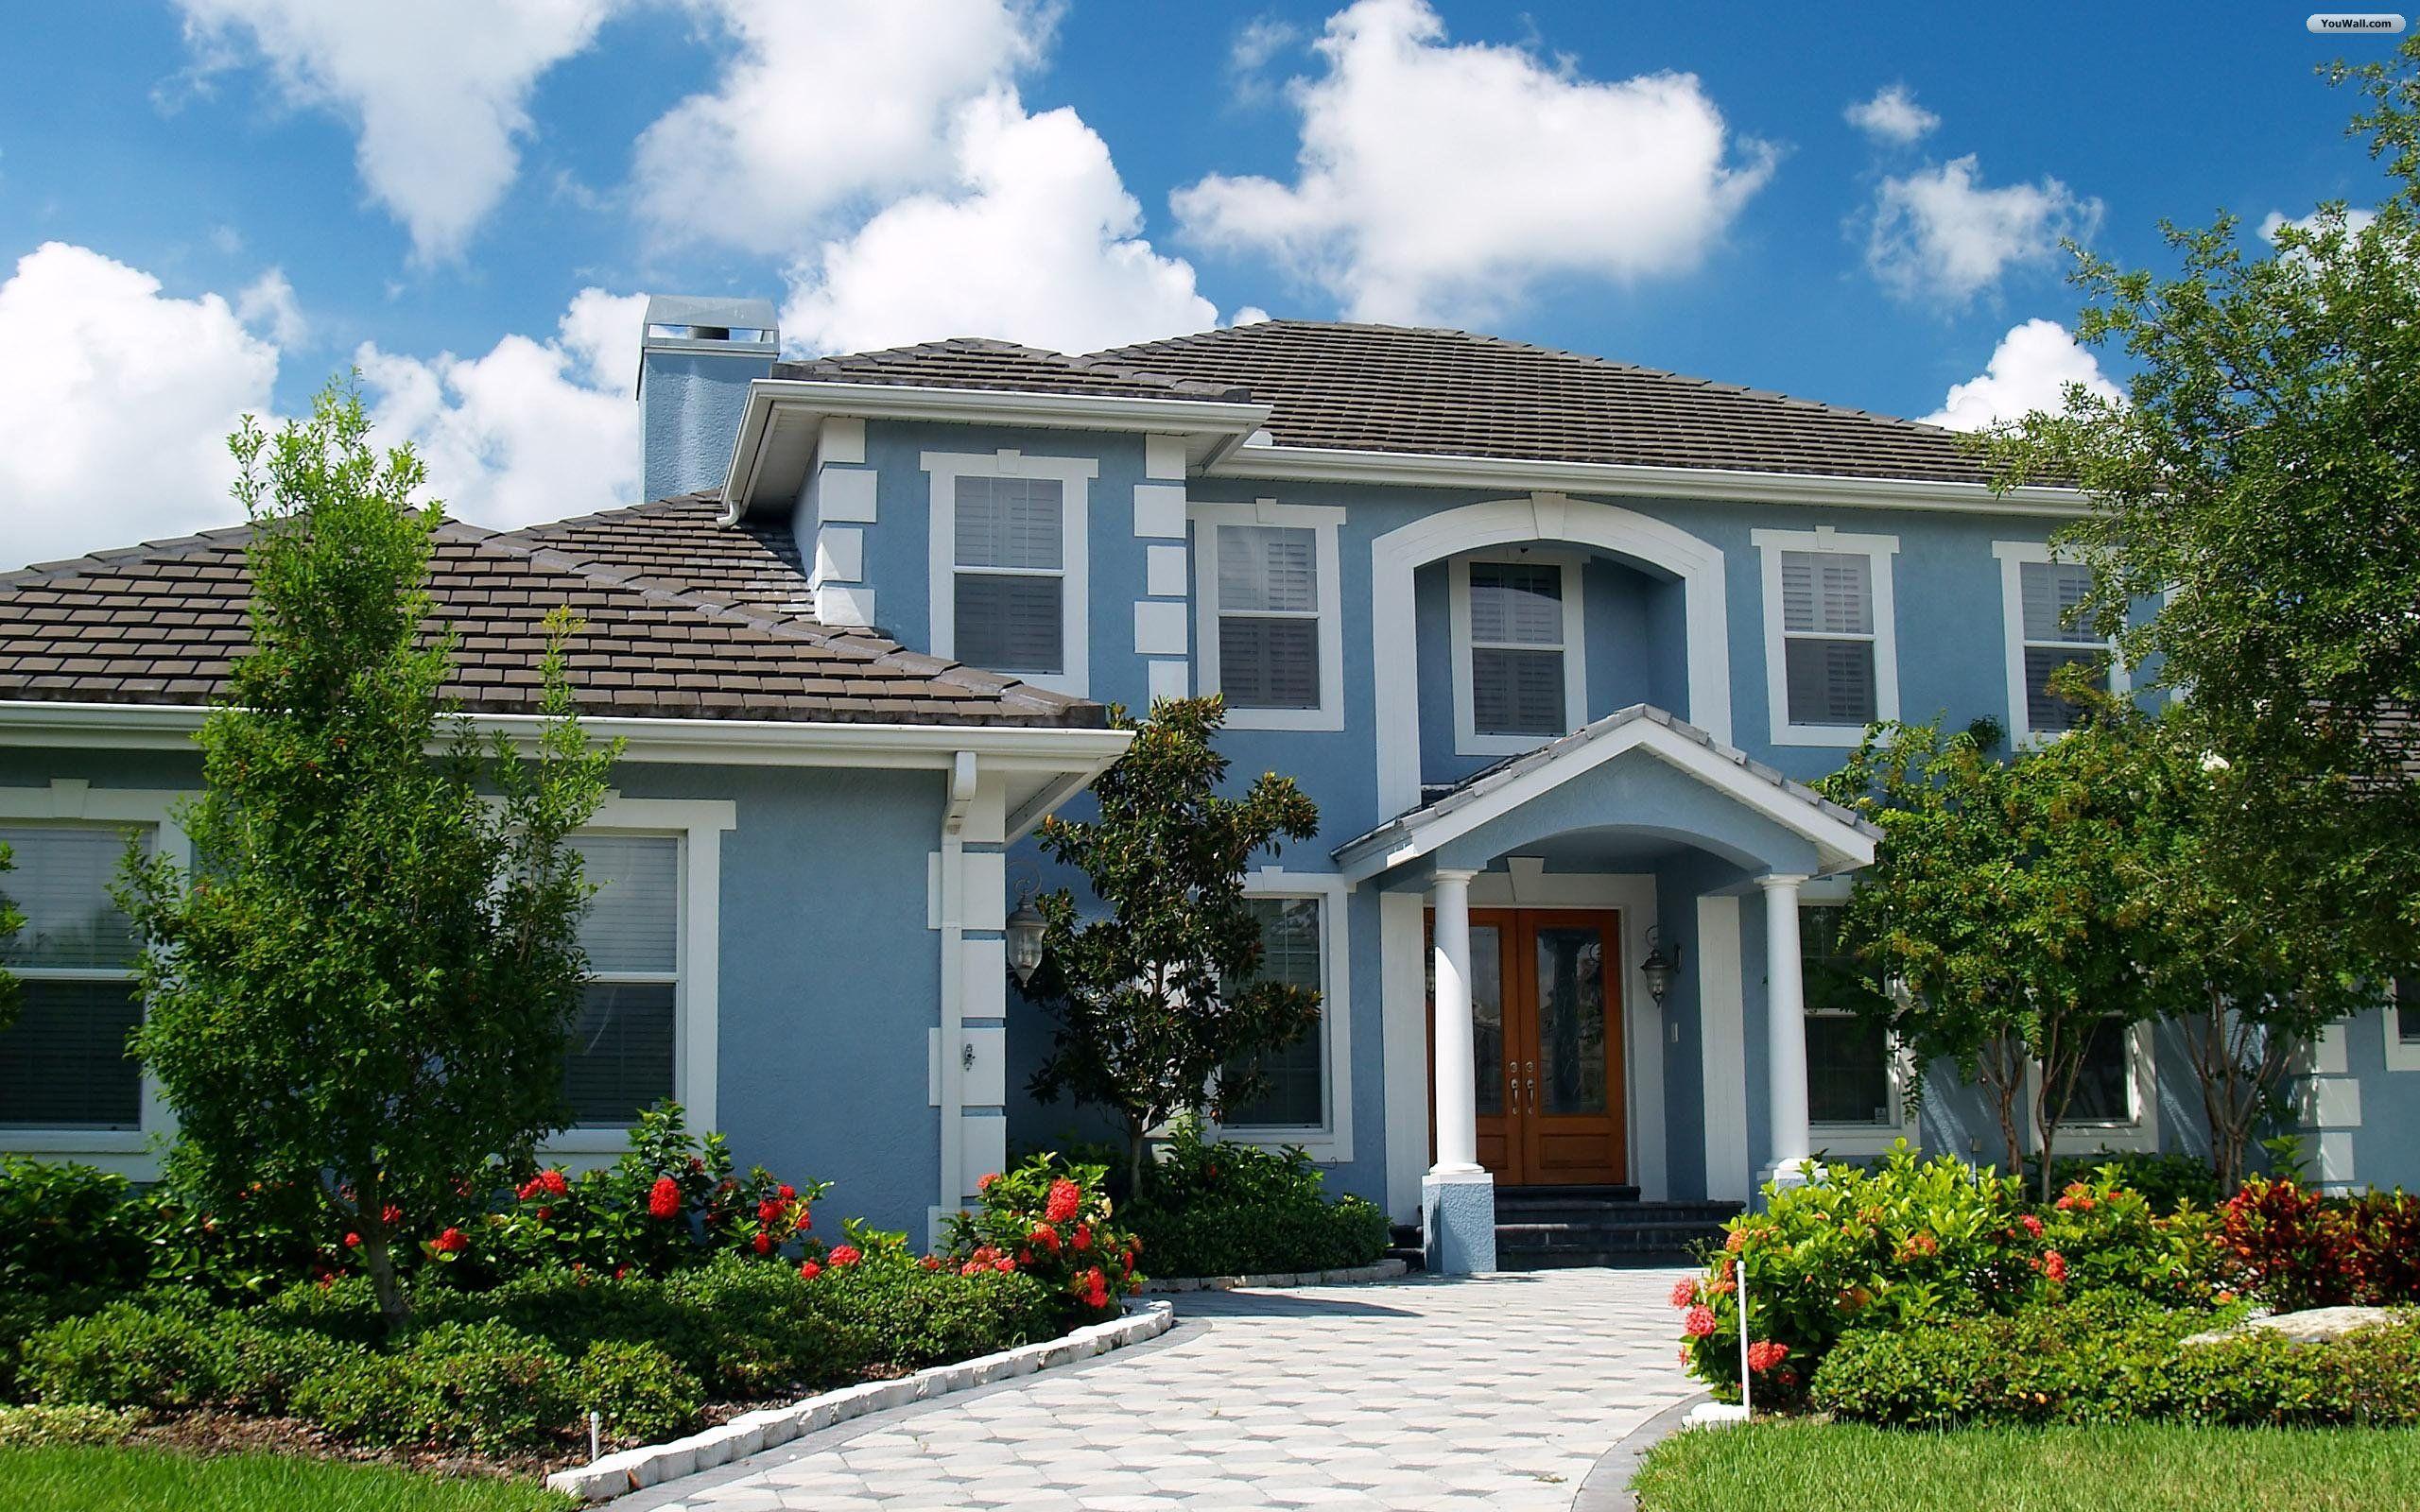 Big House Wallpaper Cheap Houses Big Beautiful Houses House